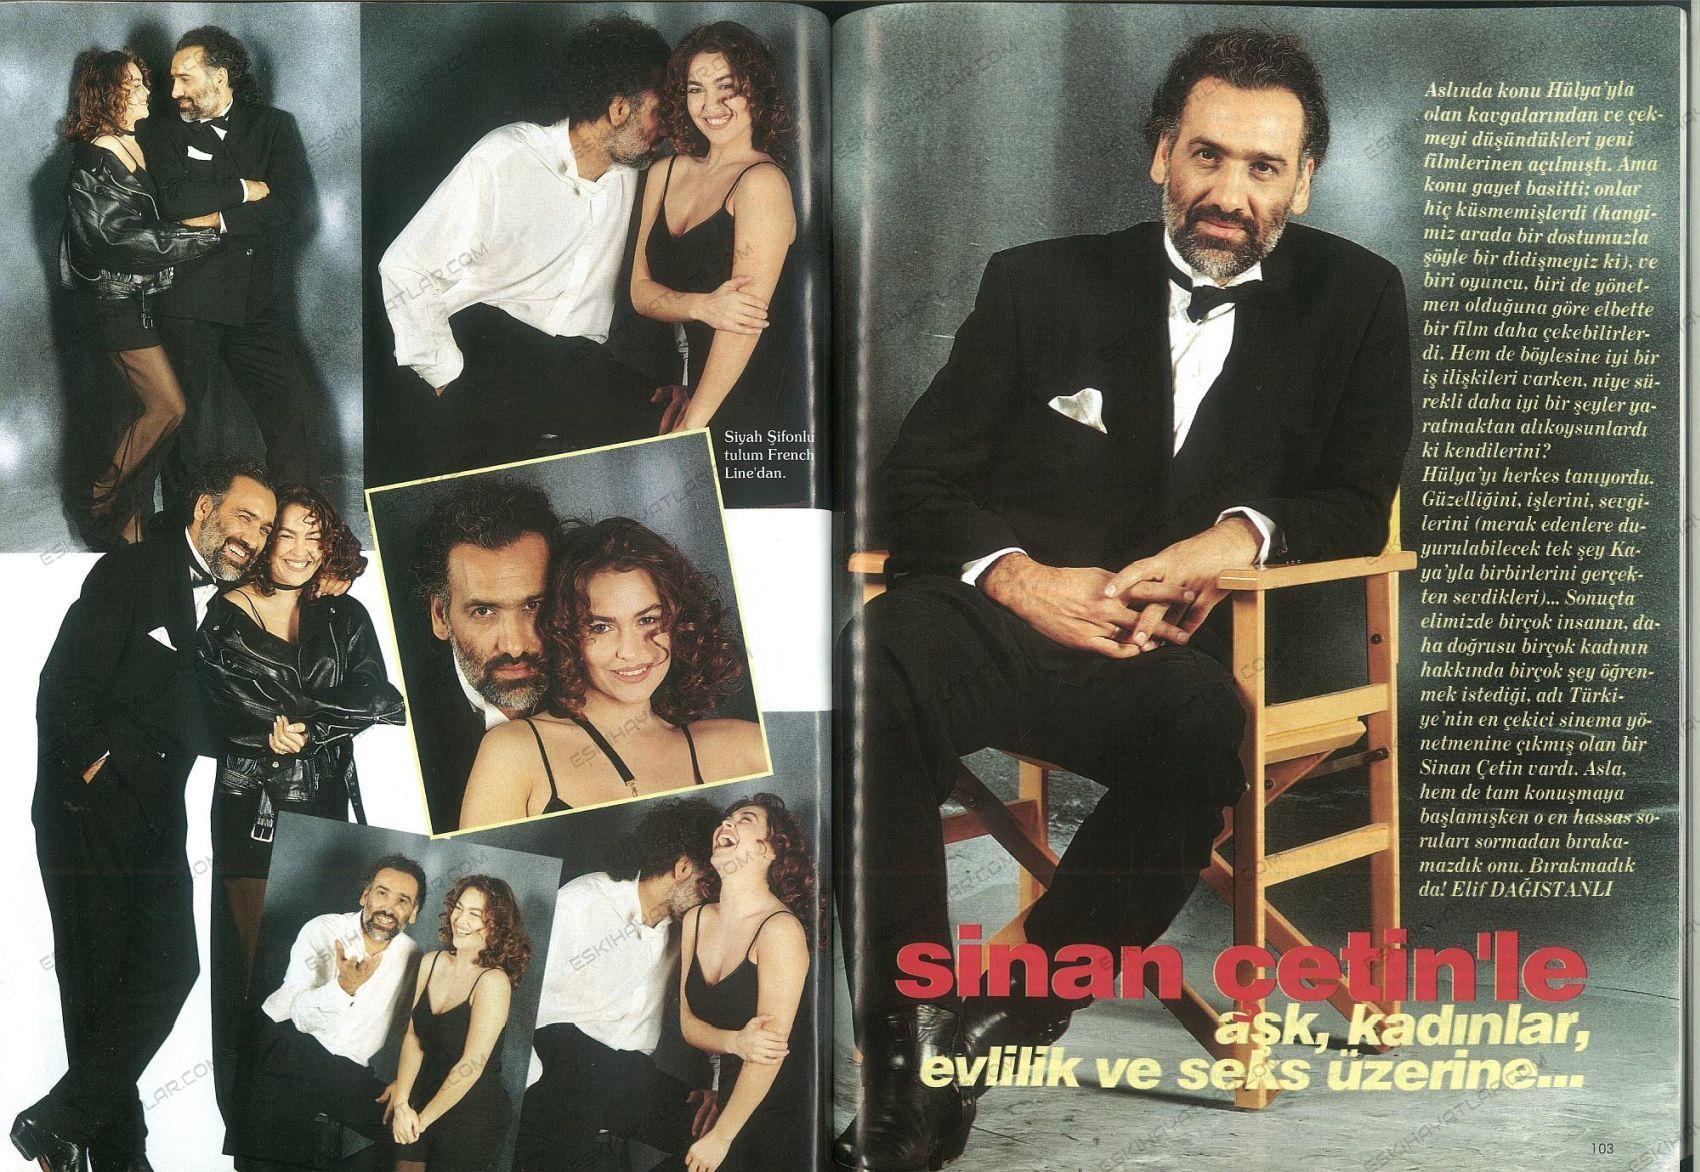 0151-cosmopolitan-1994-sinan-cetin-hulya-avsar-fotograflari (6)